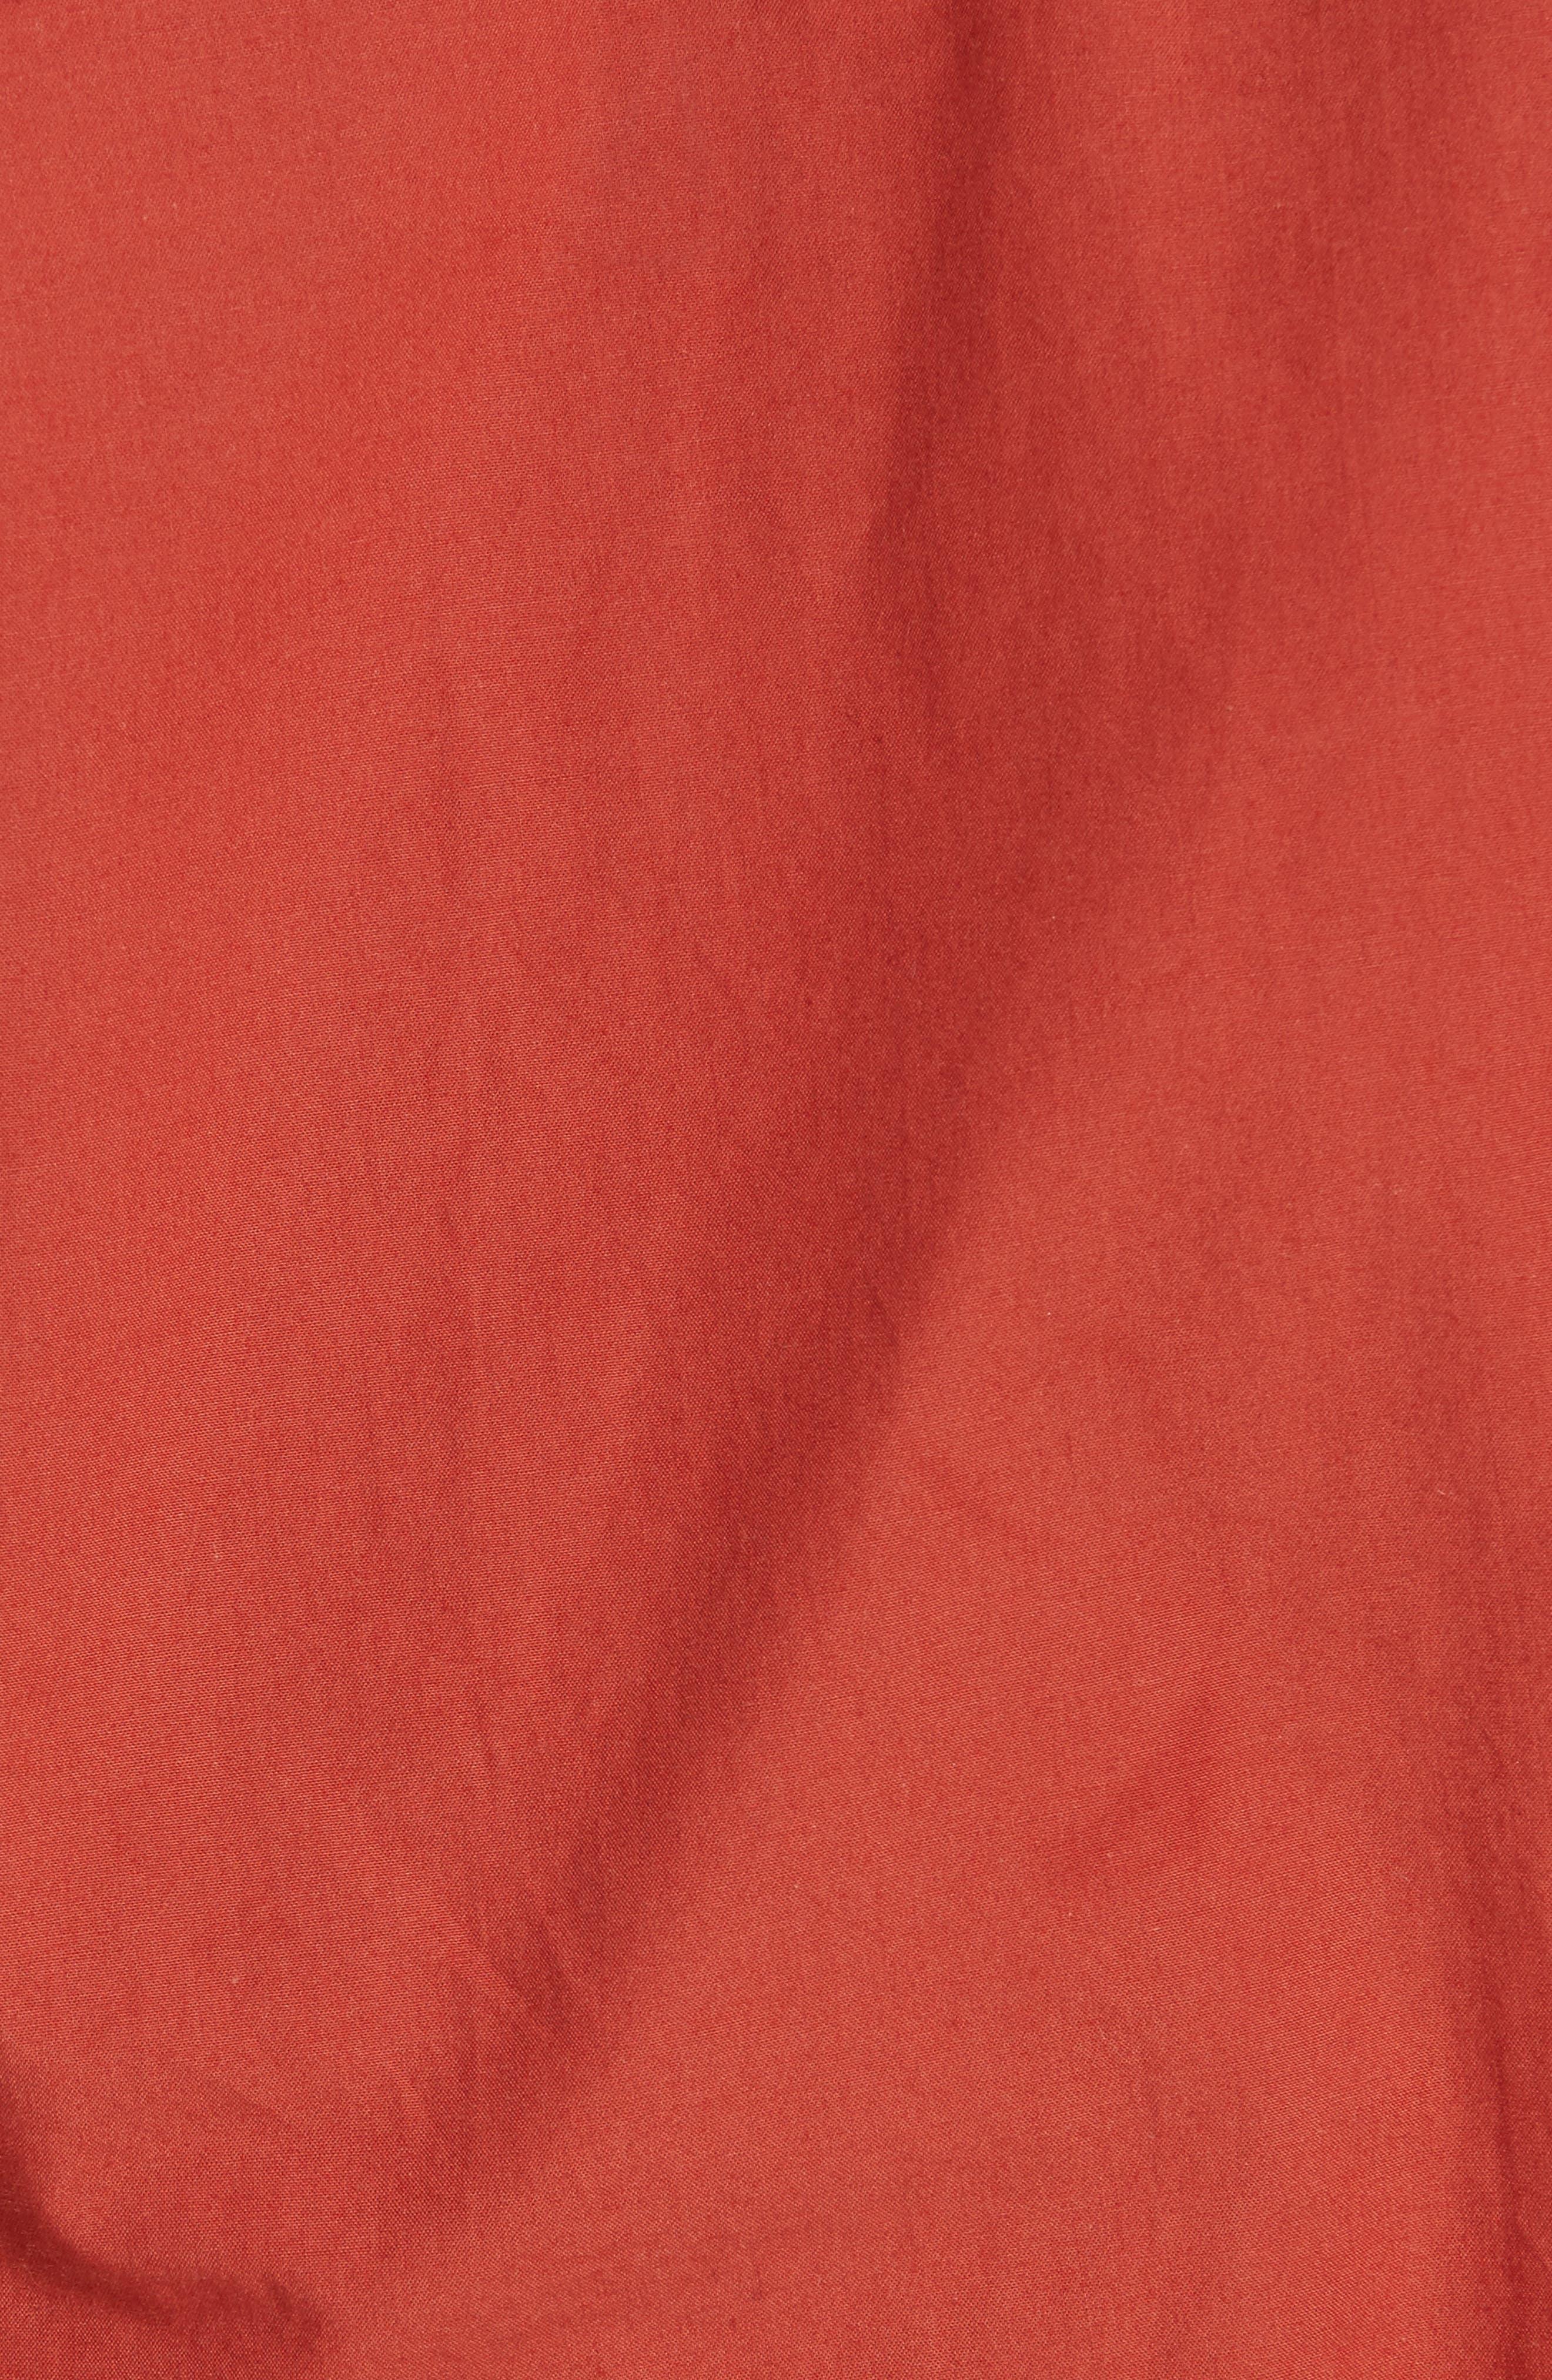 Michelle One-Shoulder Puff Sleeve Blouse,                             Alternate thumbnail 5, color,                             810